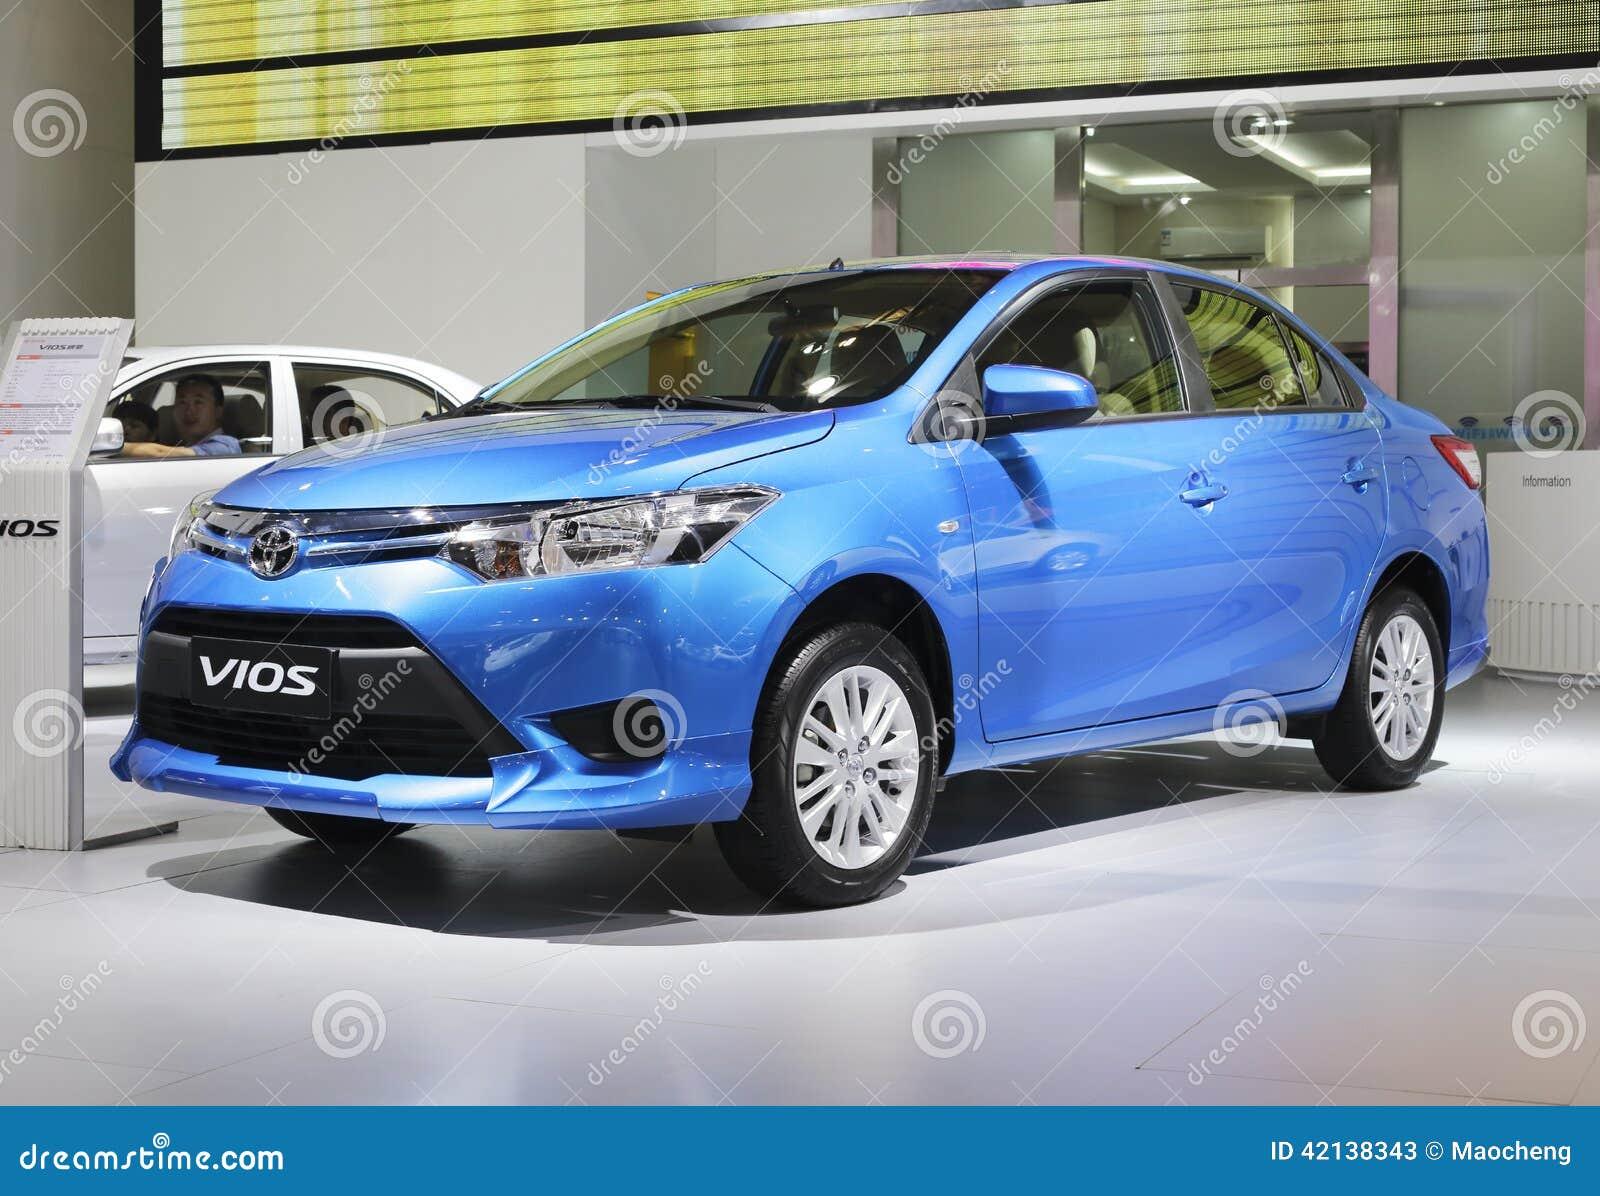 Blue Toyota Vios Car Editorial Stock Photo Image Of Taiwan 42138343